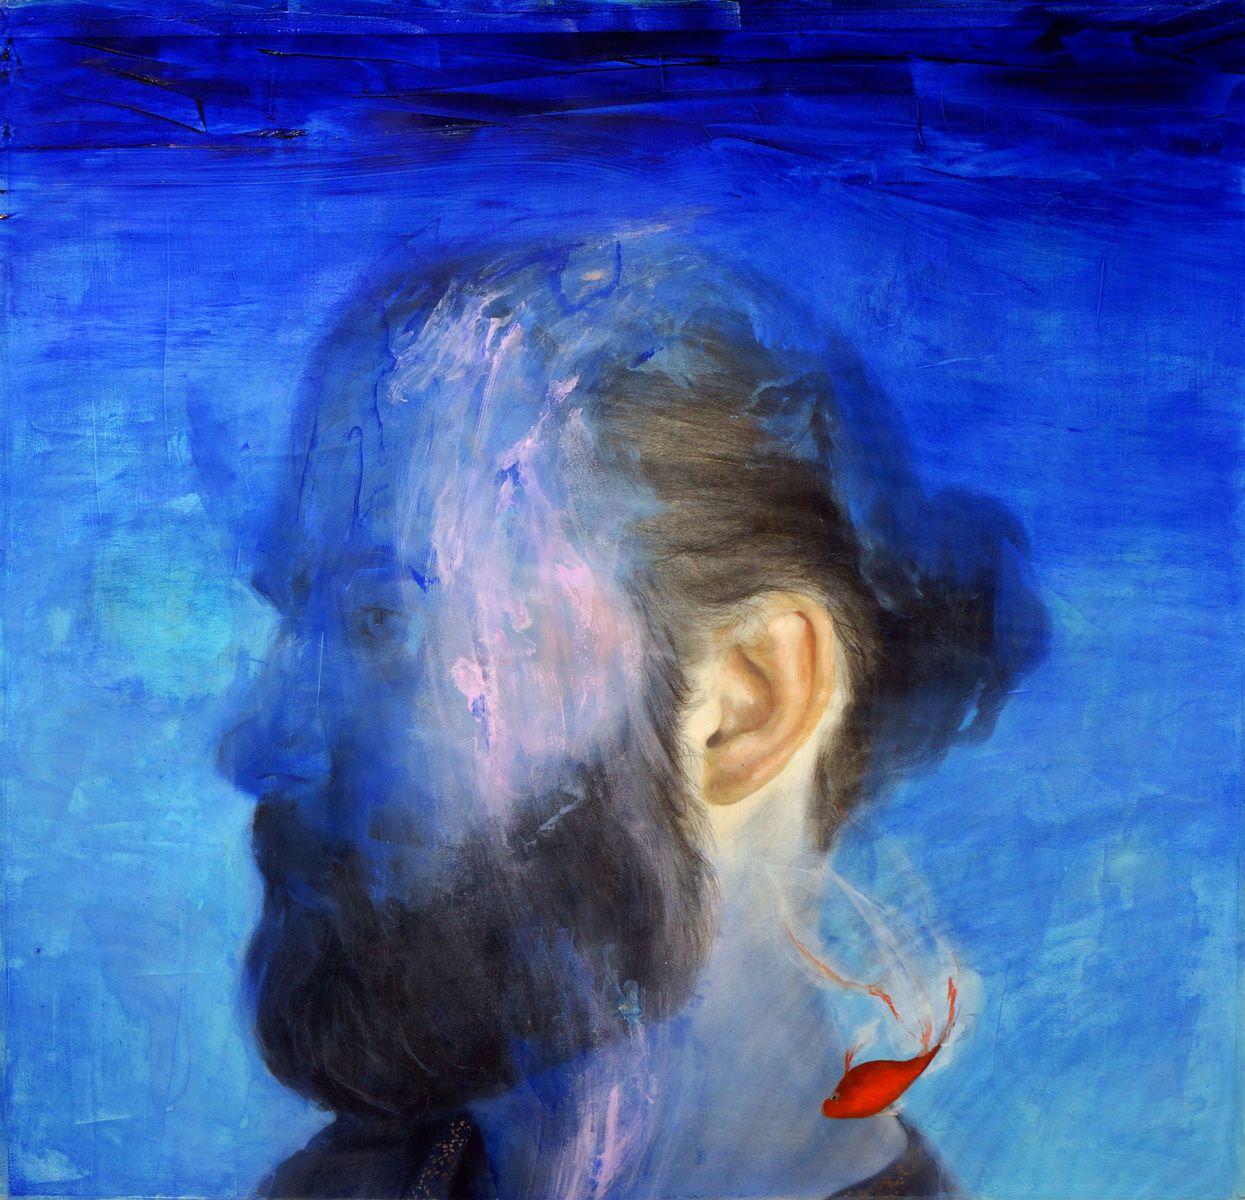 Jean paul mallozzi dont block my flow denver art art